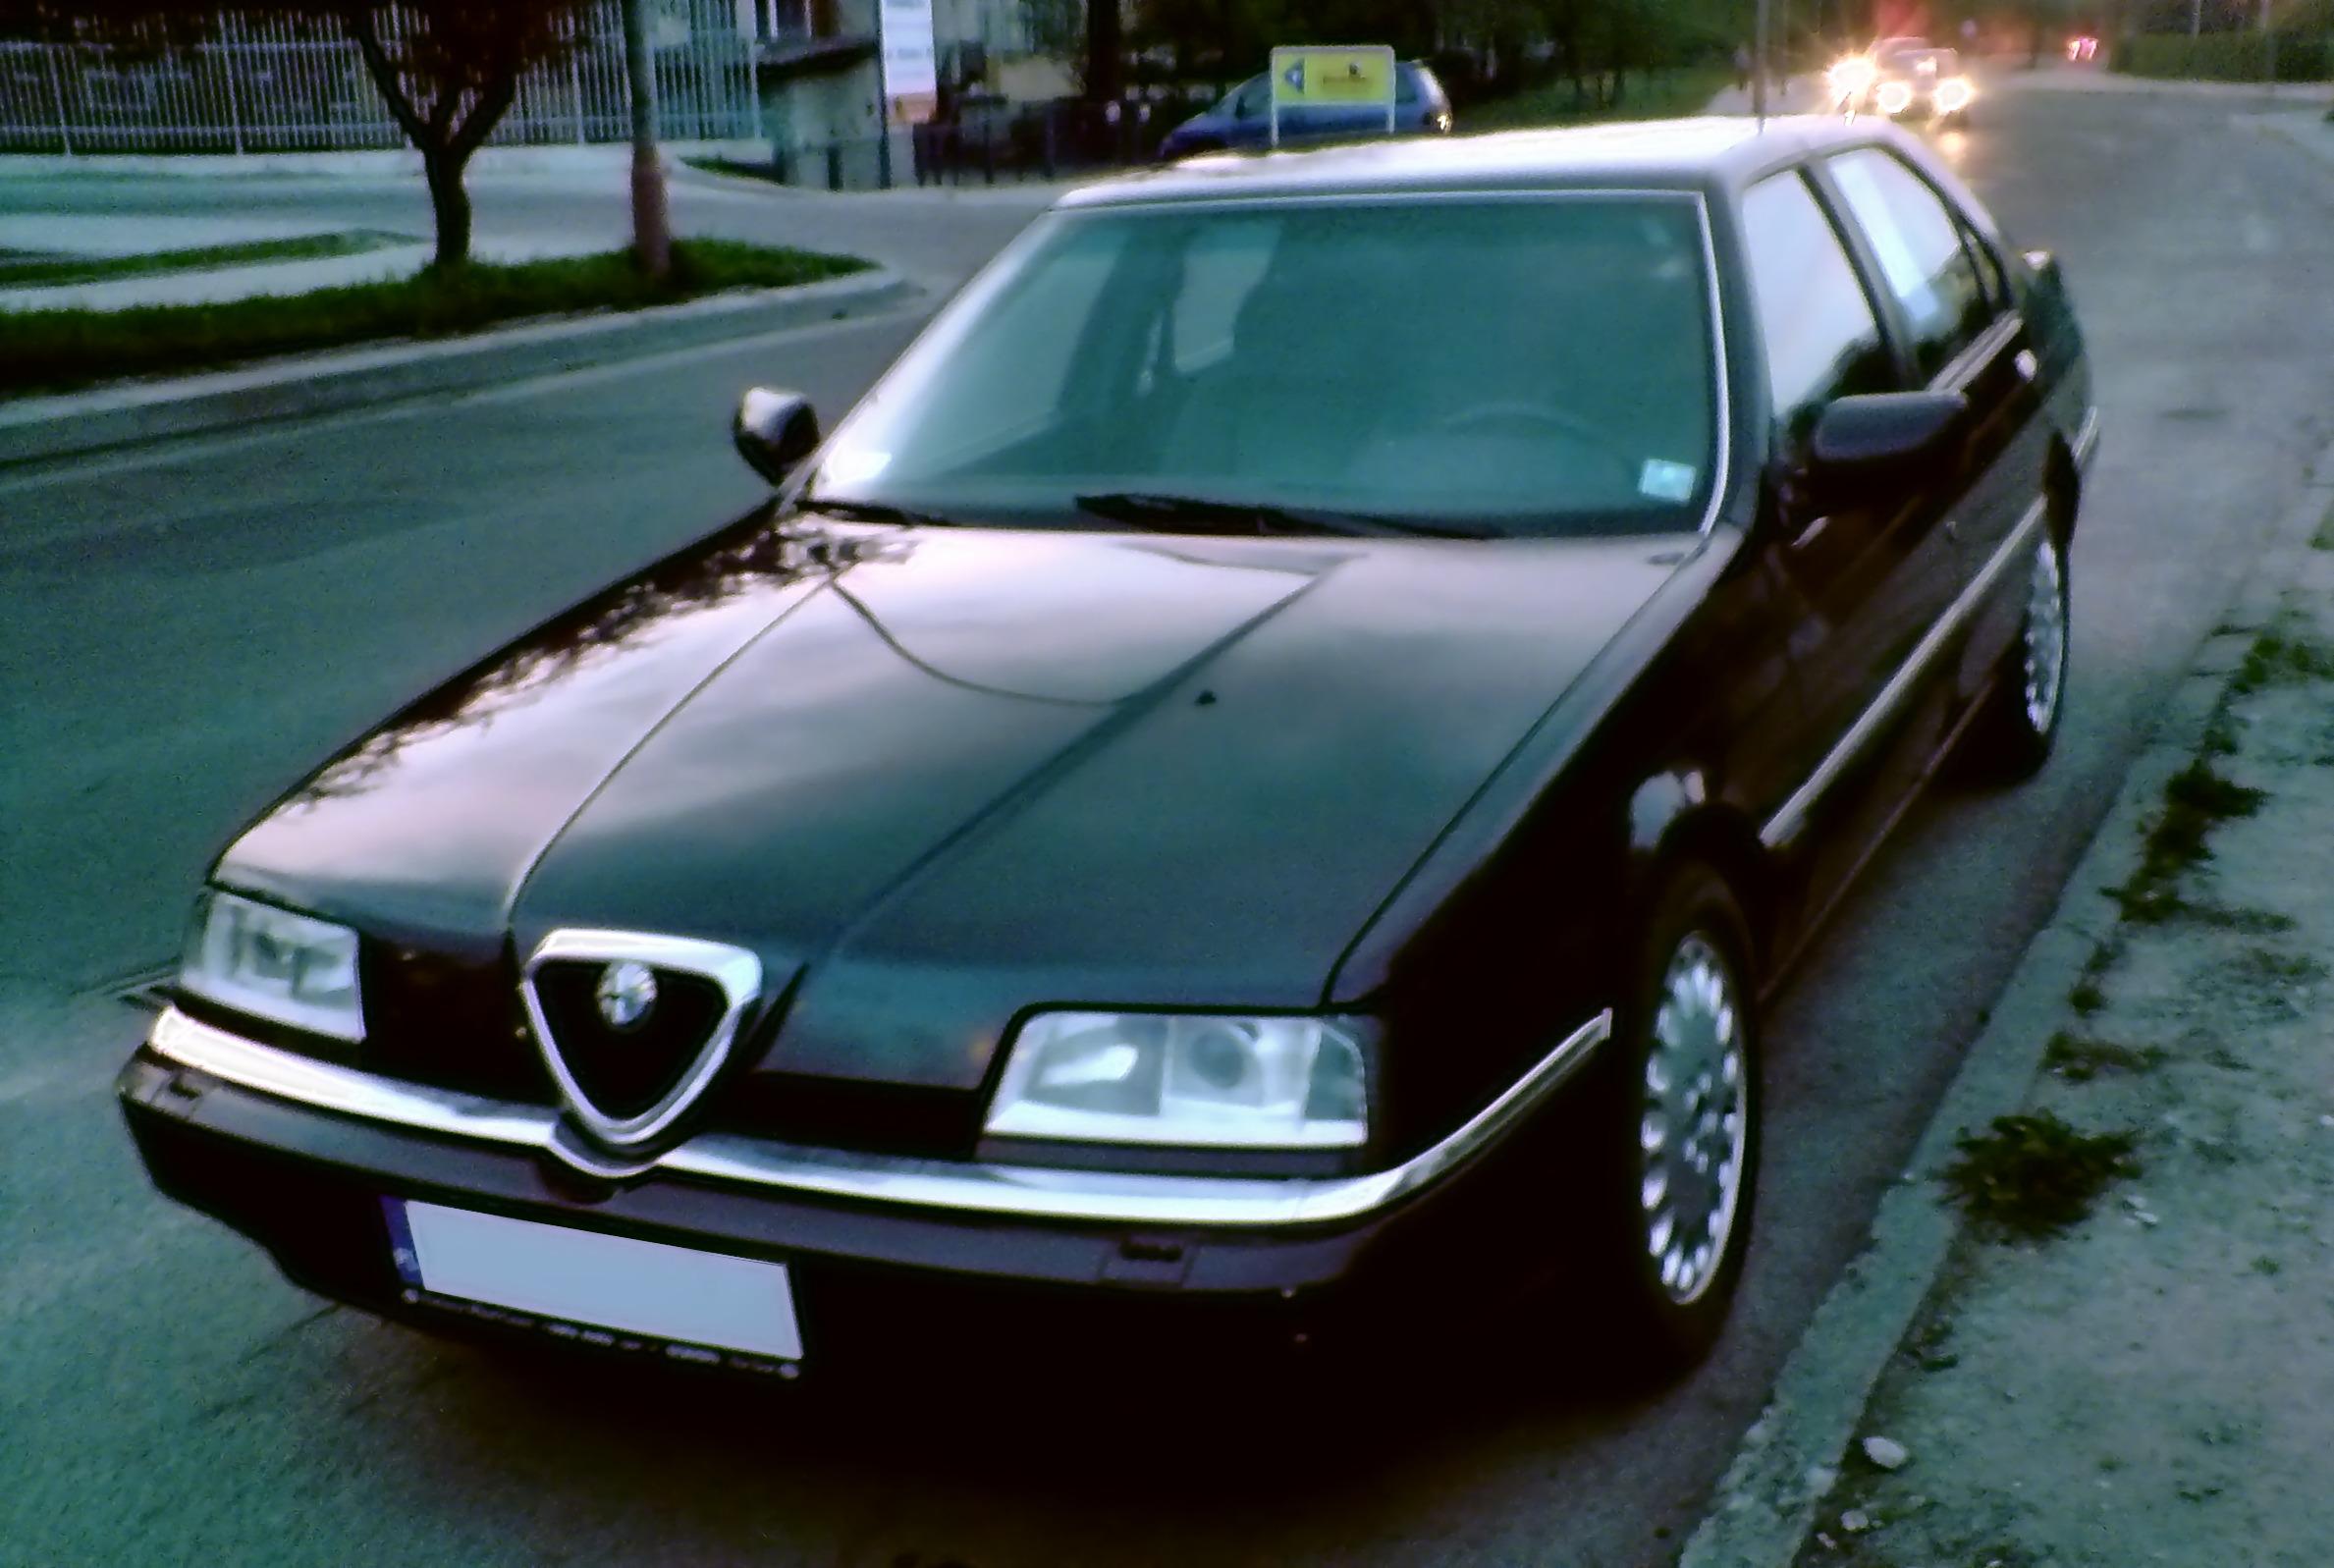 File:Alfa 164 front jaslo.jpg